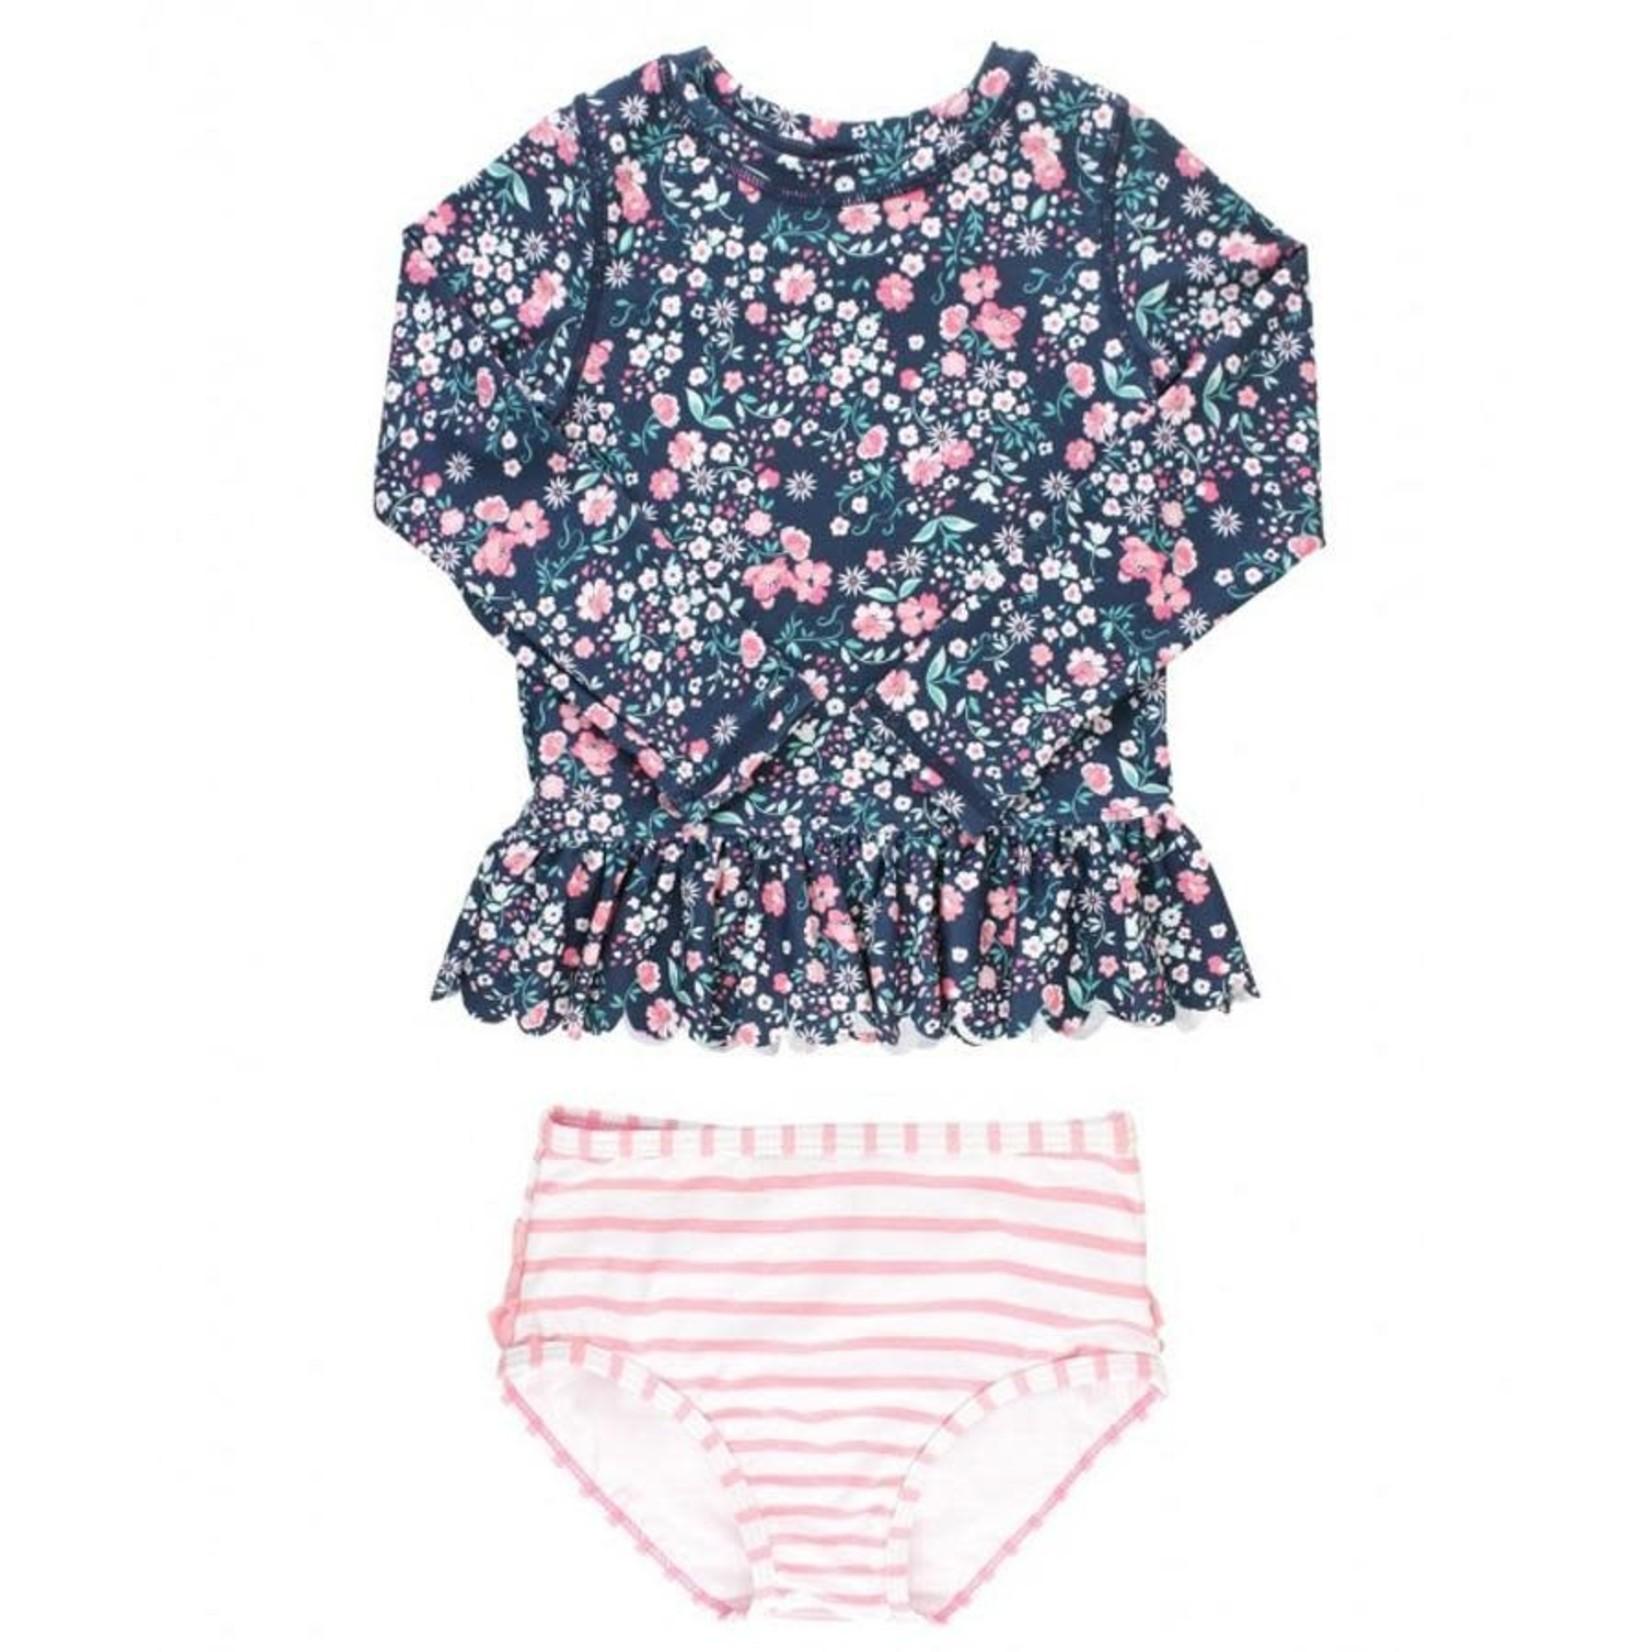 RuffleButts Moonlit Meadow Peplum Rash Guard Bikini